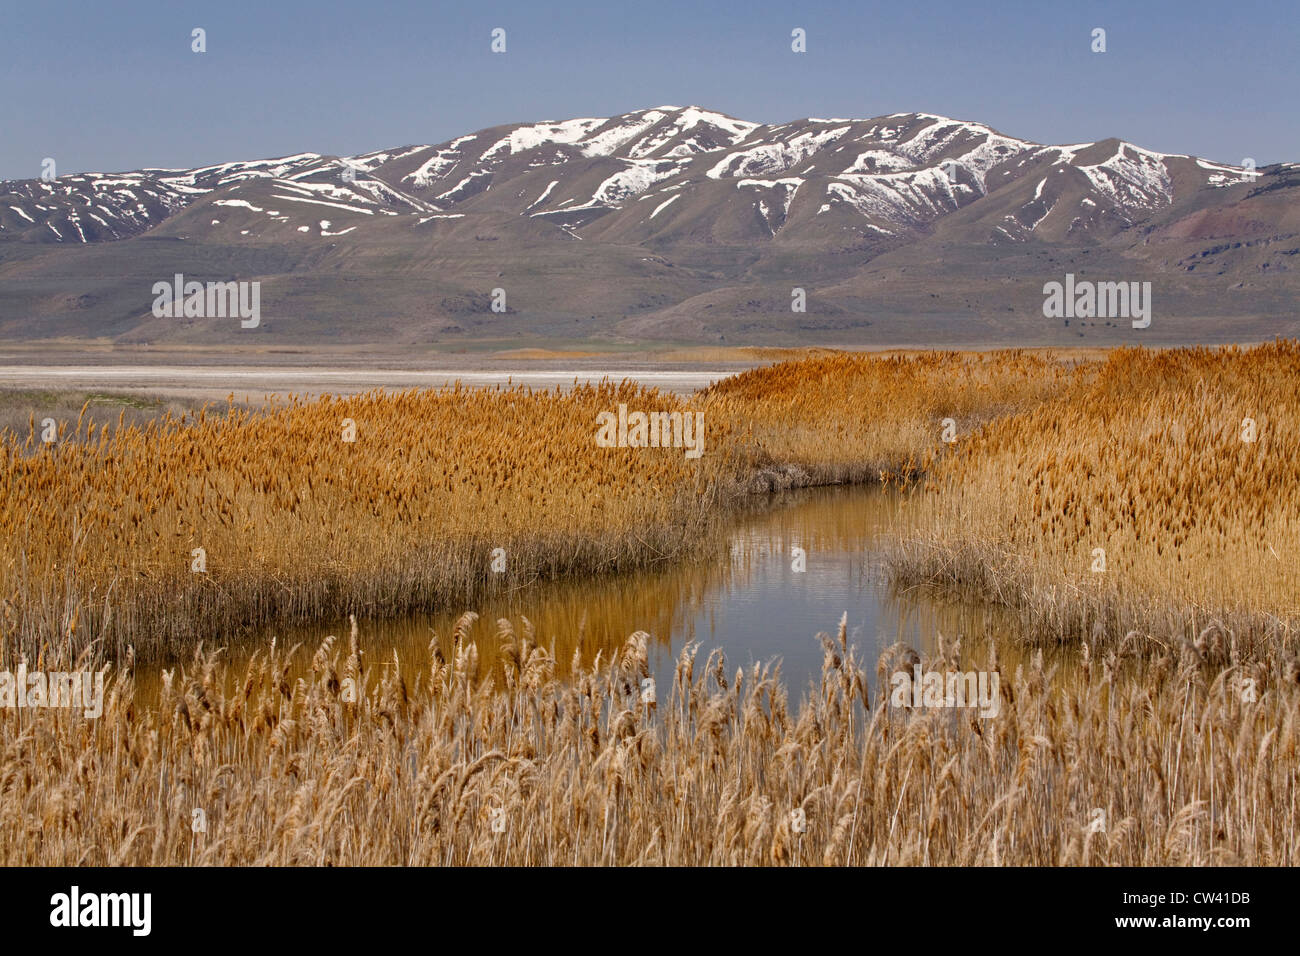 Reeds growing in the lake, Bear River Migratory Bird Refuge, Ogden, Utah, USA - Stock Image